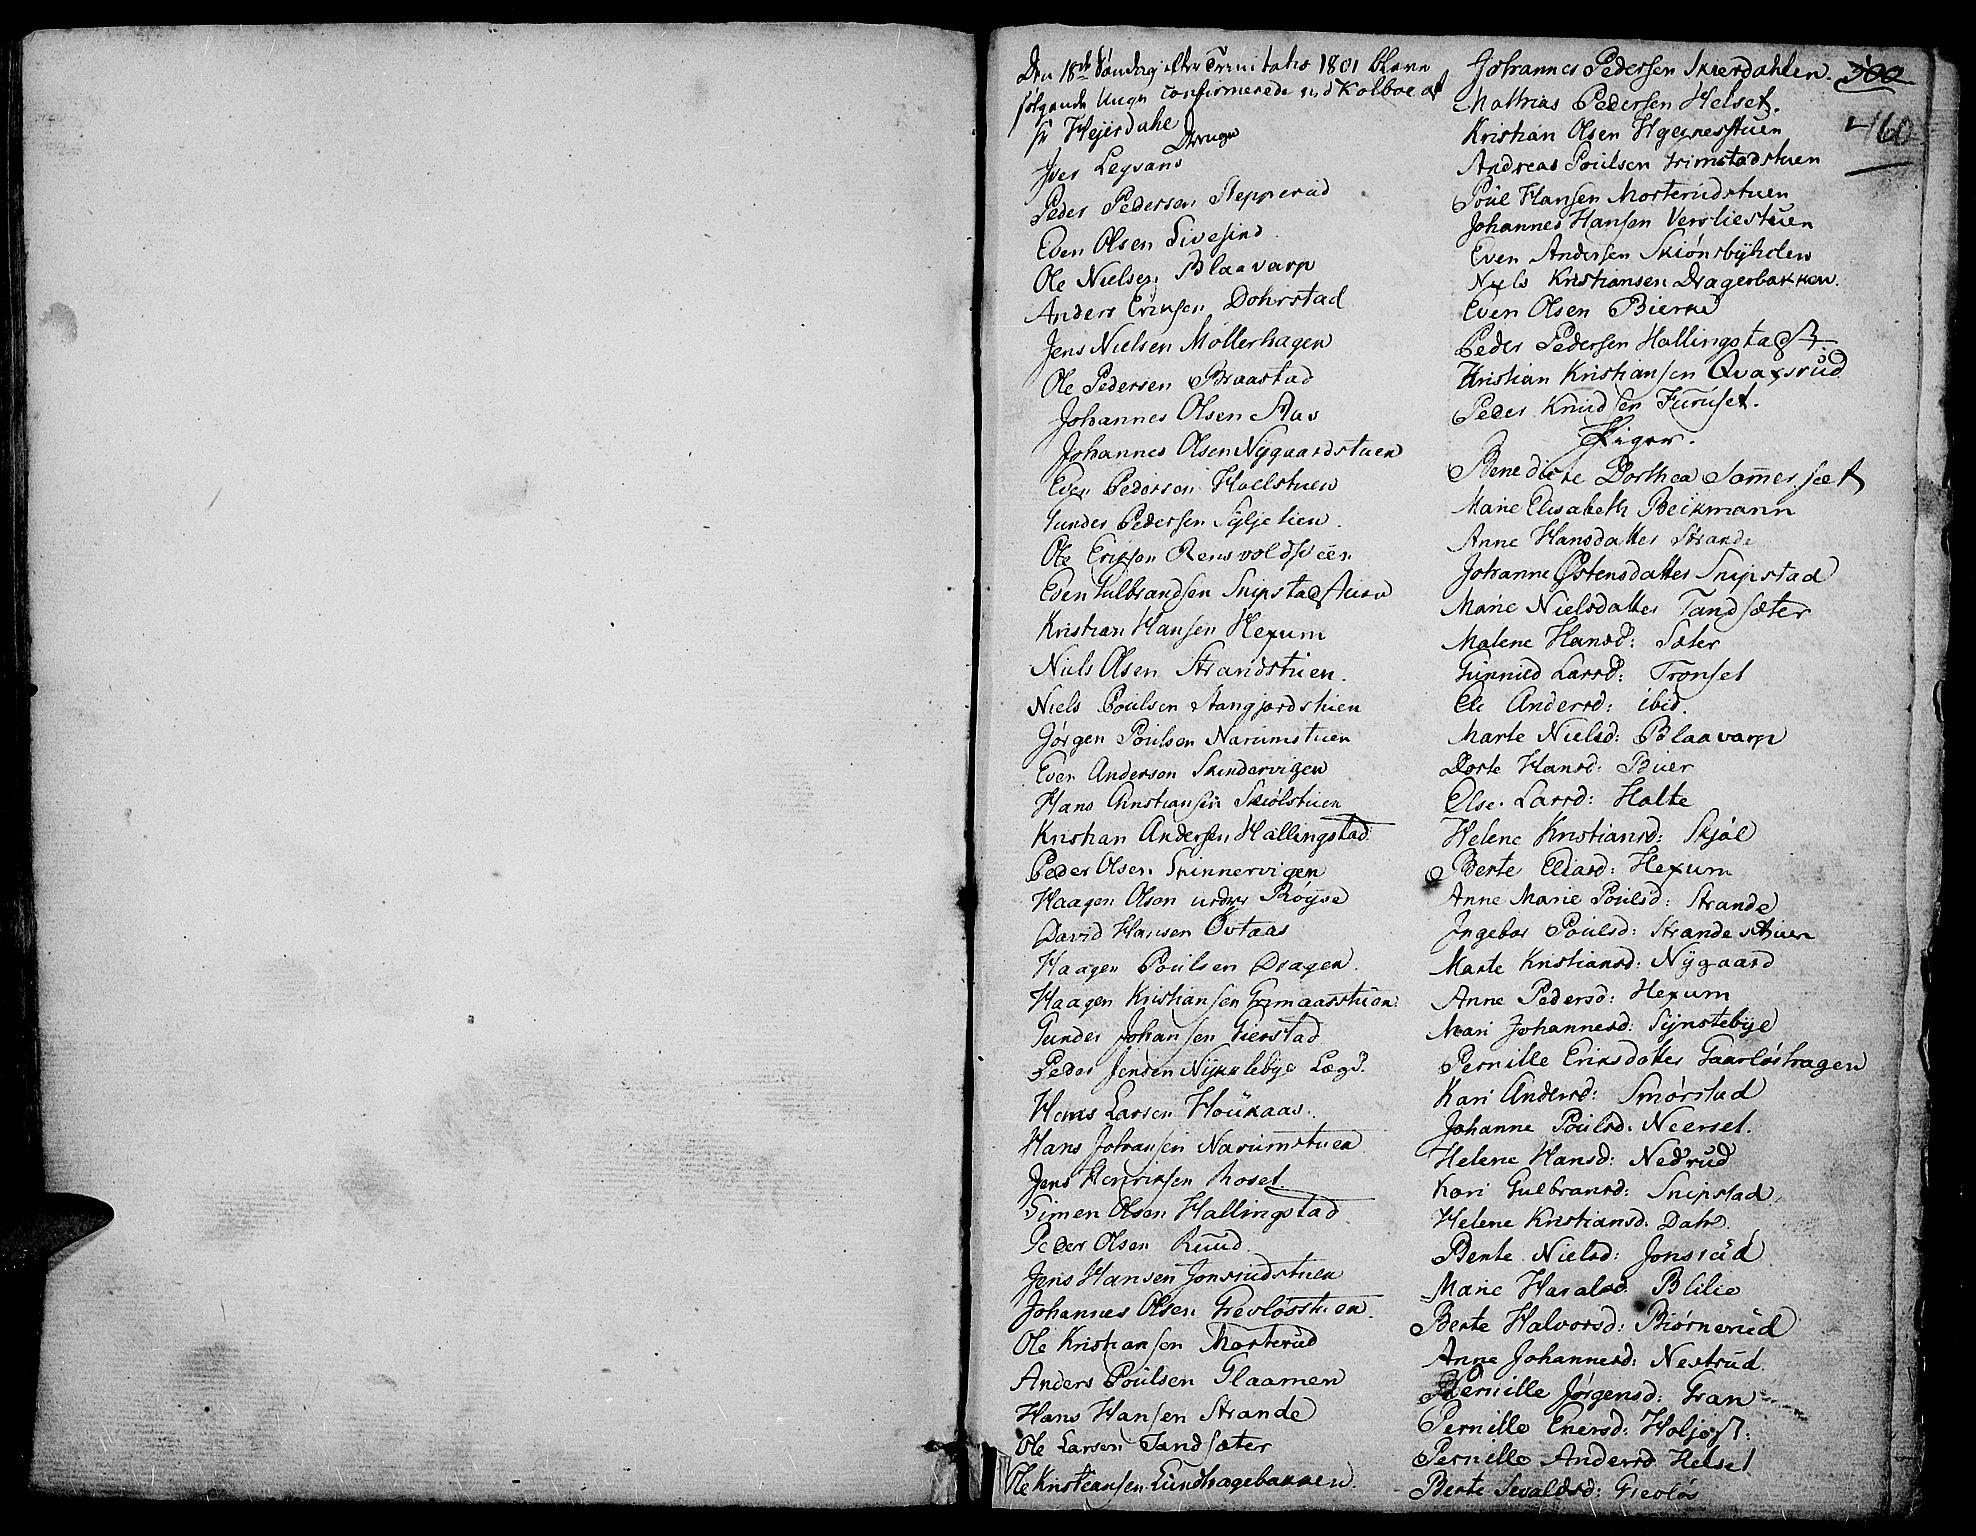 SAH, Toten prestekontor, Ministerialbok nr. 7, 1794-1809, s. 460